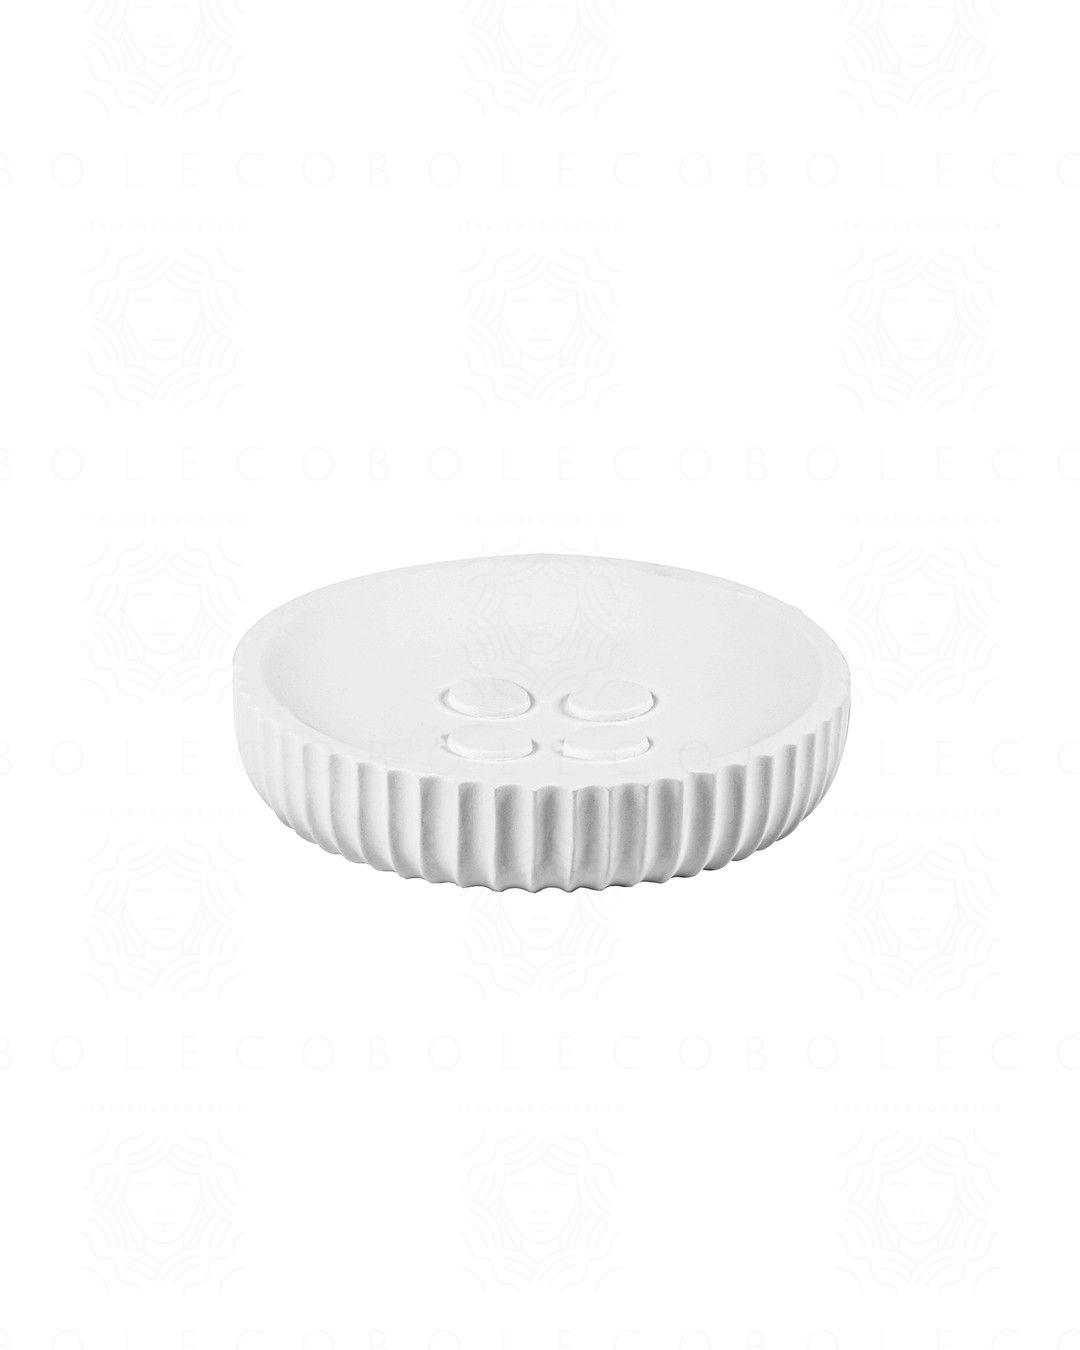 Porta sapone Plisse cm. 11,5x2,5